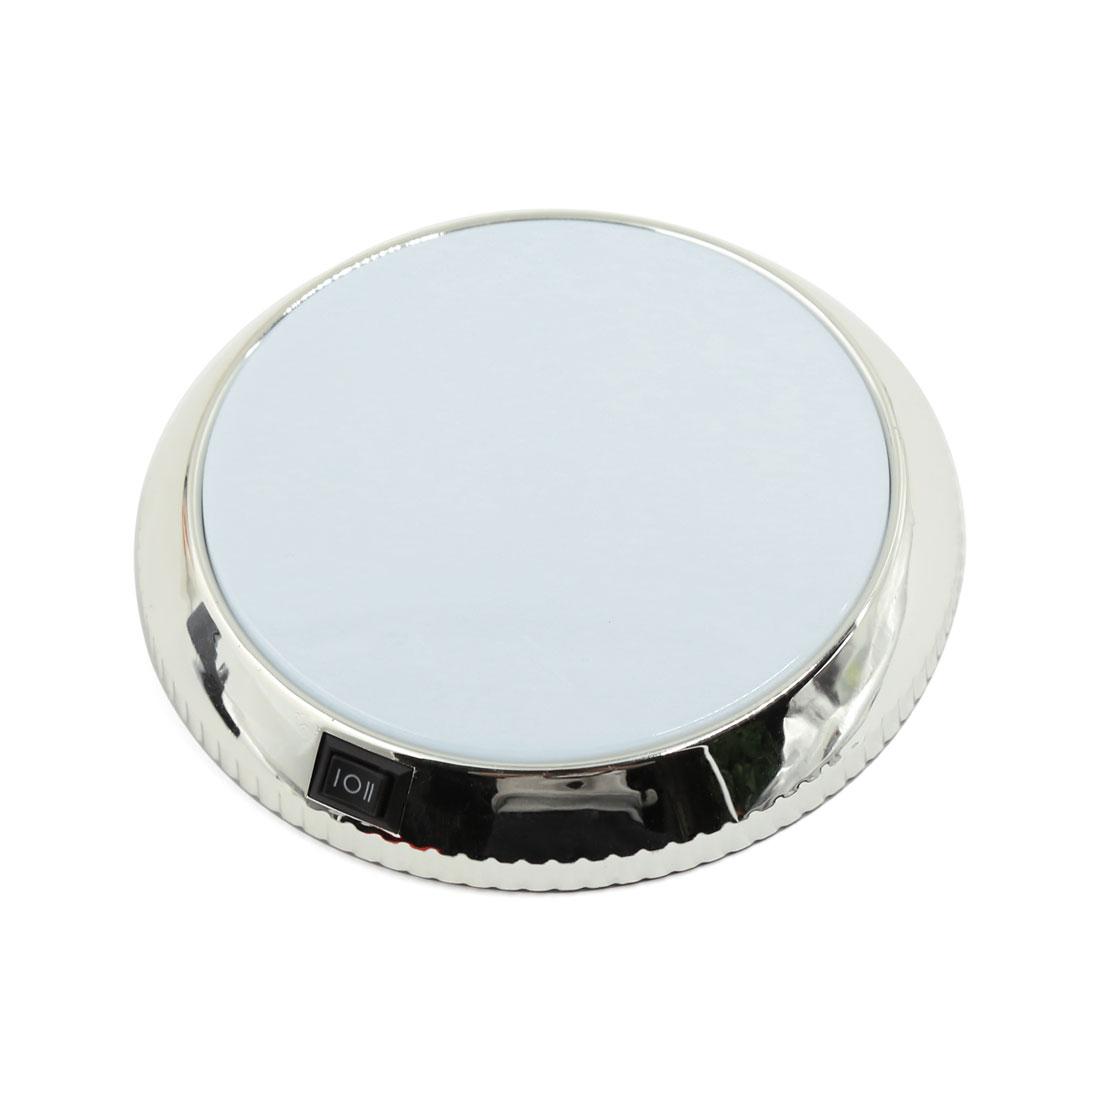 "Chrome White Car Interior Light Auto Roof Dome Celling Lamp Bulb 5"" Diameter"